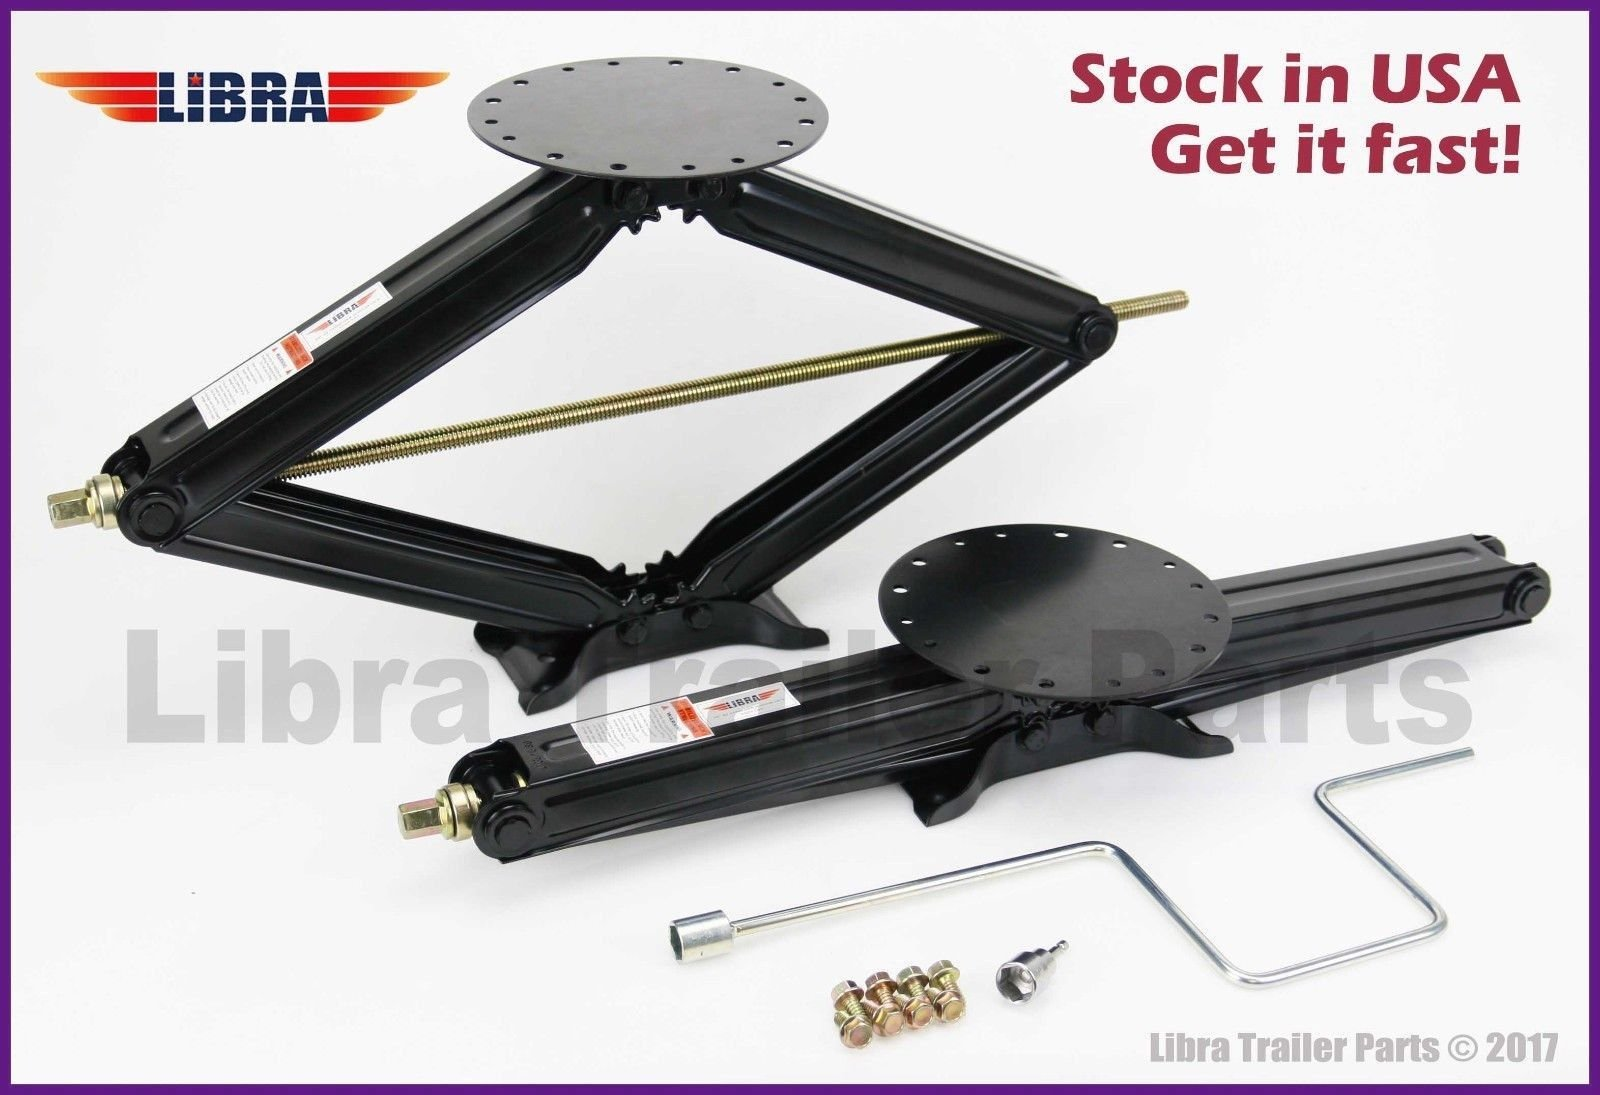 LIBRA Set of 2 5000 lb 30'' RV Trailer Stabilizer Leveling Scissor Jacks w/Handle and Socket - 26021 ... by LIBRA